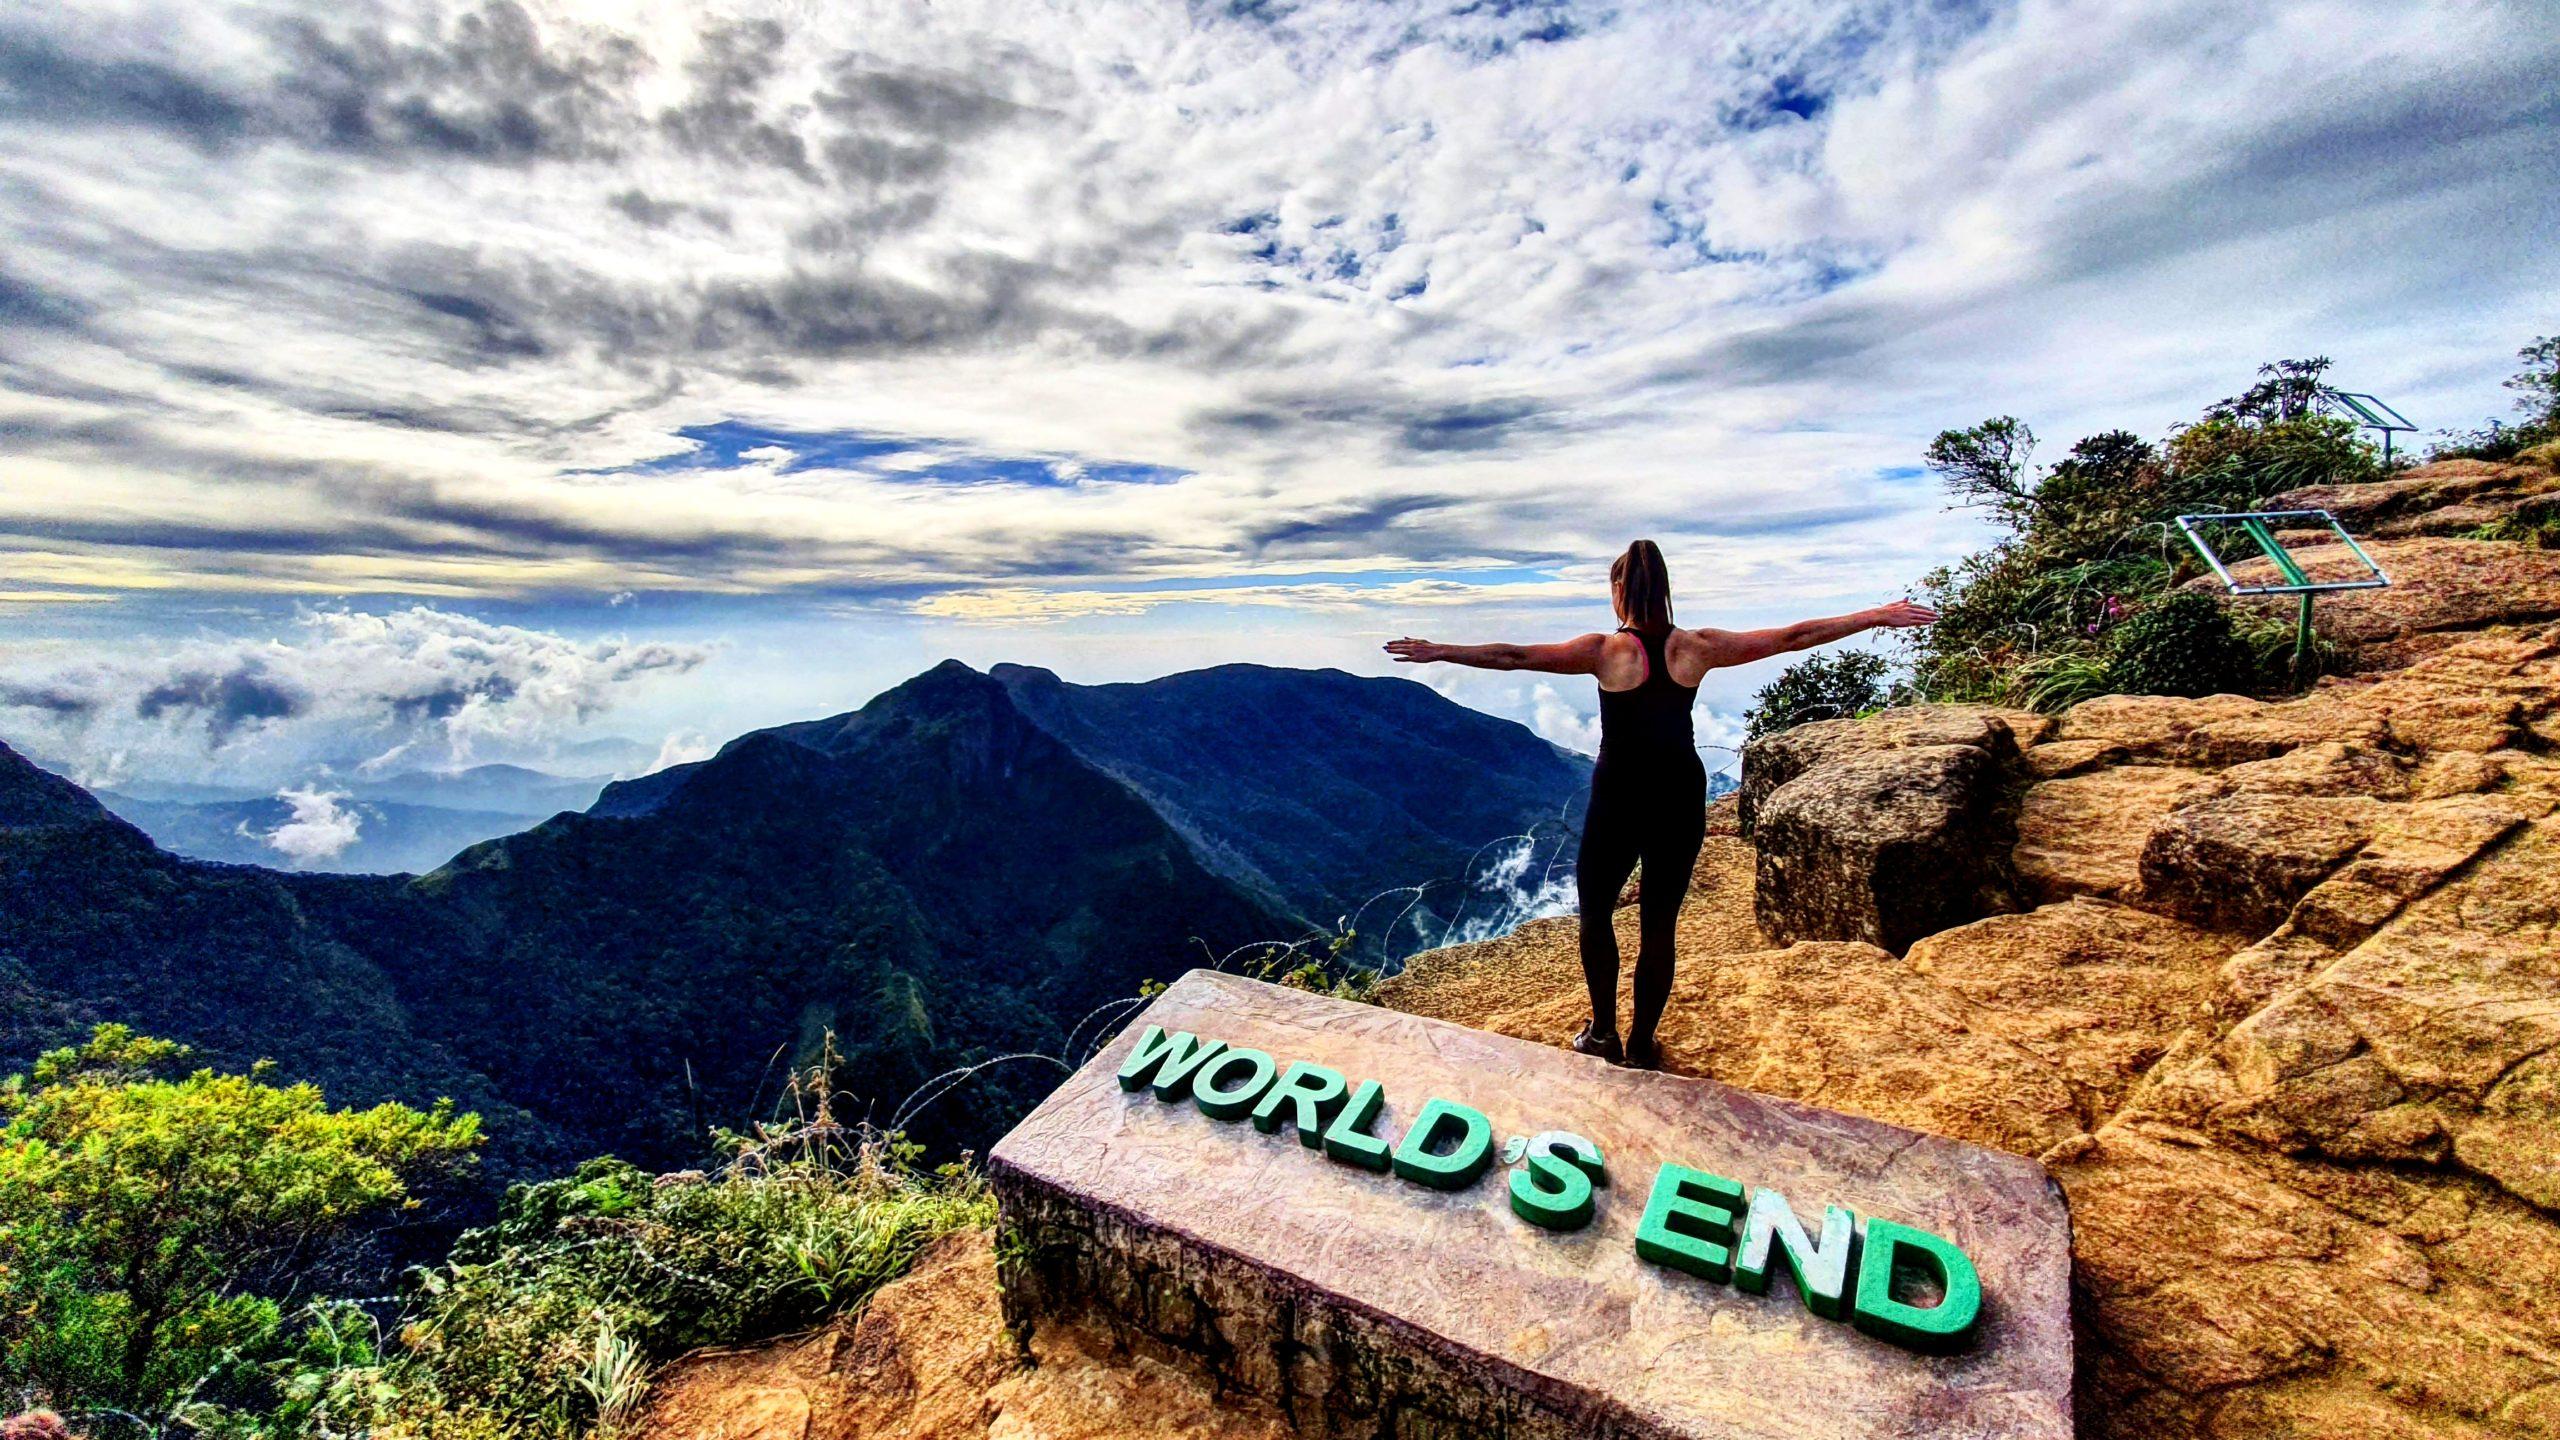 World's End Horton Plains Sri Lanka worth doing